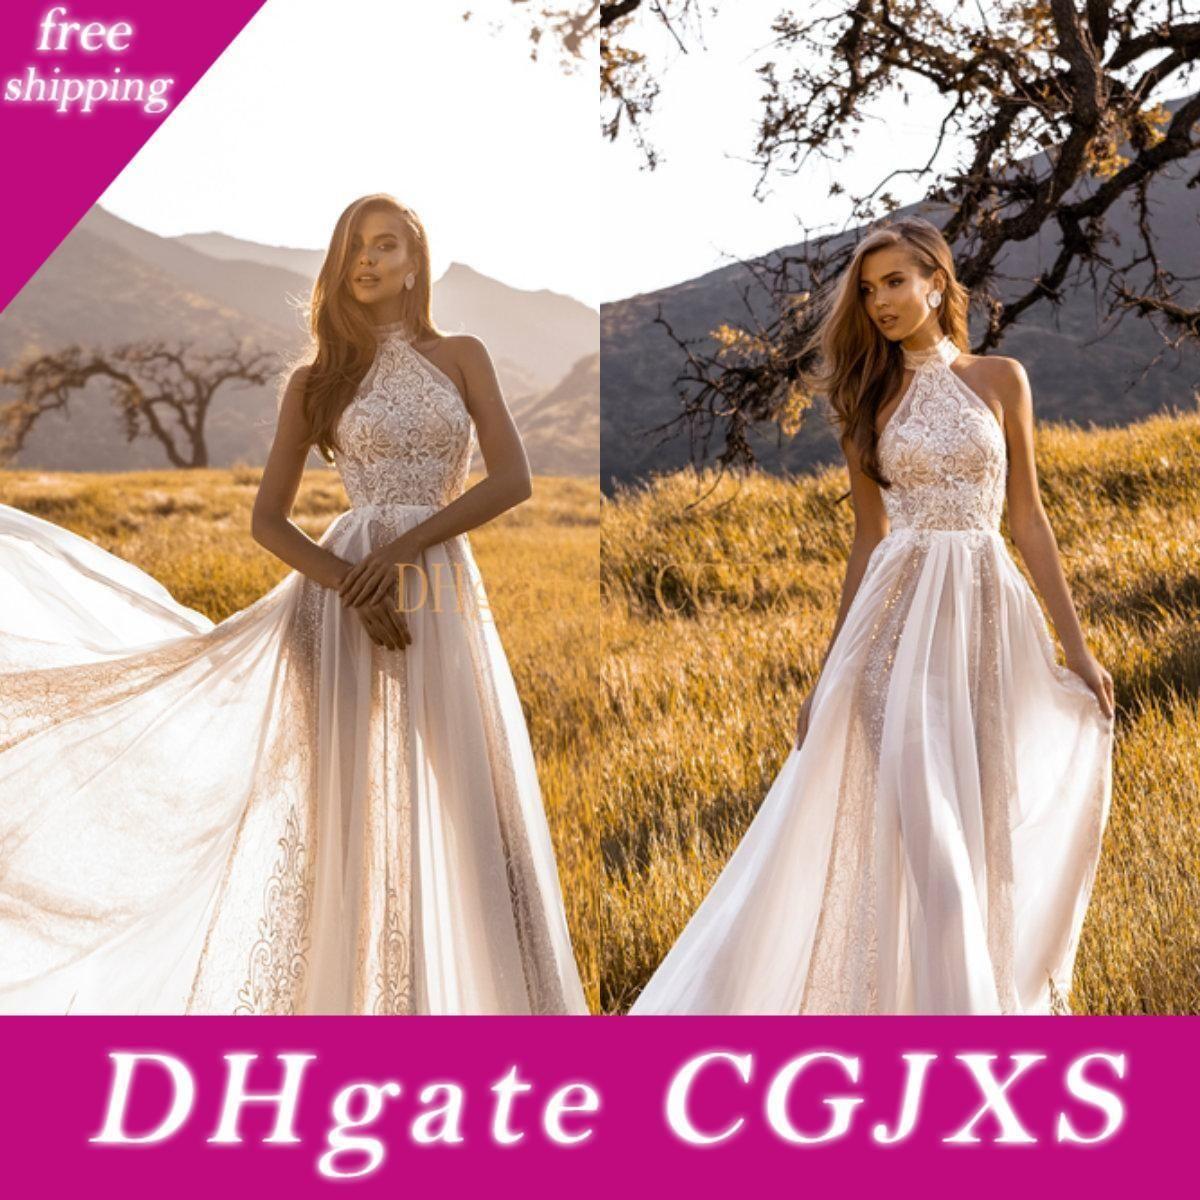 2020 New Summer Boho Wedding Dresses Garden Bohemian A Line Halter Neck Lace Bodice Long Beach Country Bridal Gowns